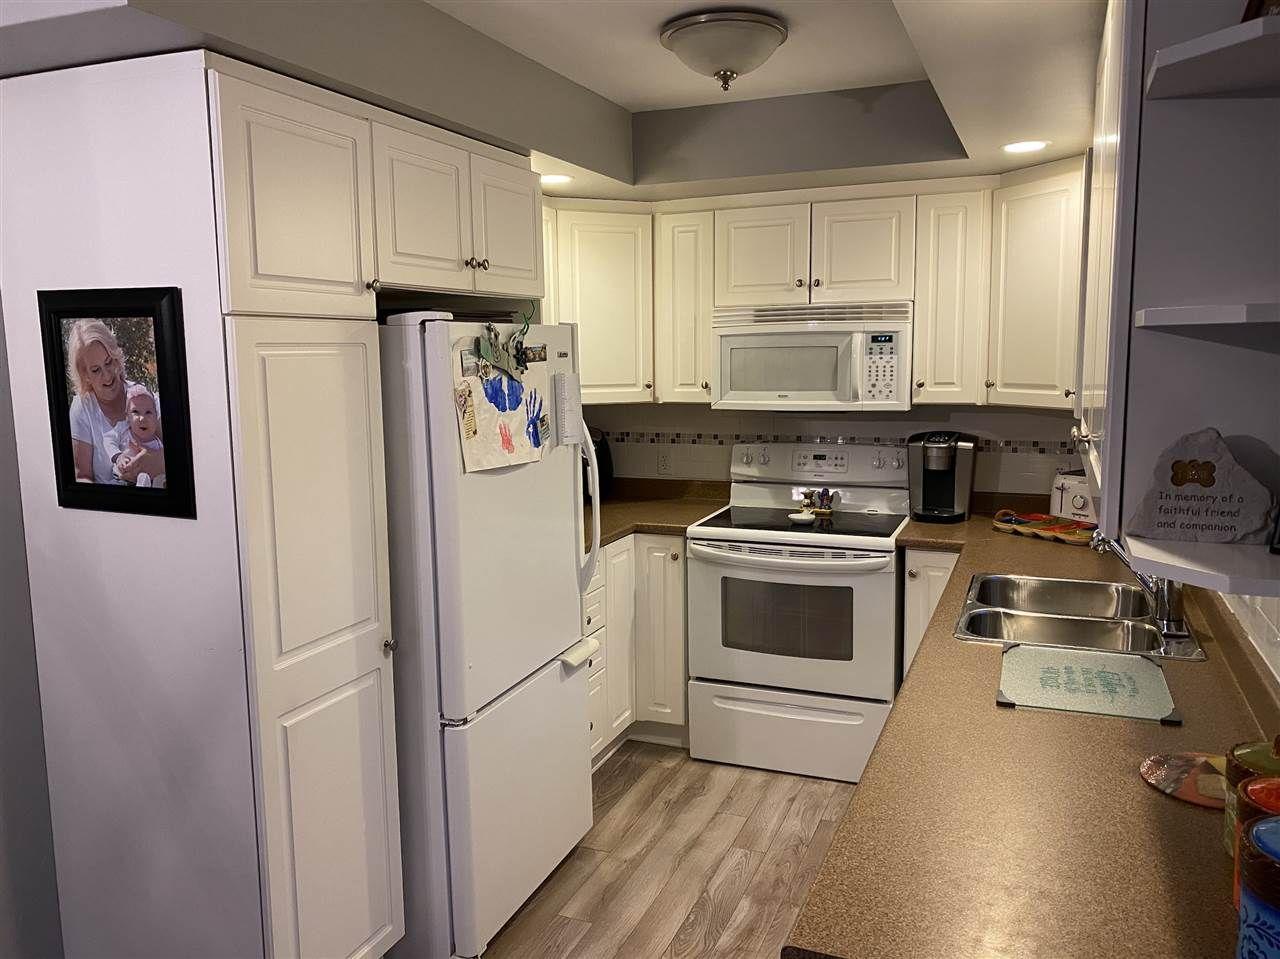 Photo 6: Photos: 7327 Main Street in Louisbourg: 206-Louisbourg Residential for sale (Cape Breton)  : MLS®# 202025505